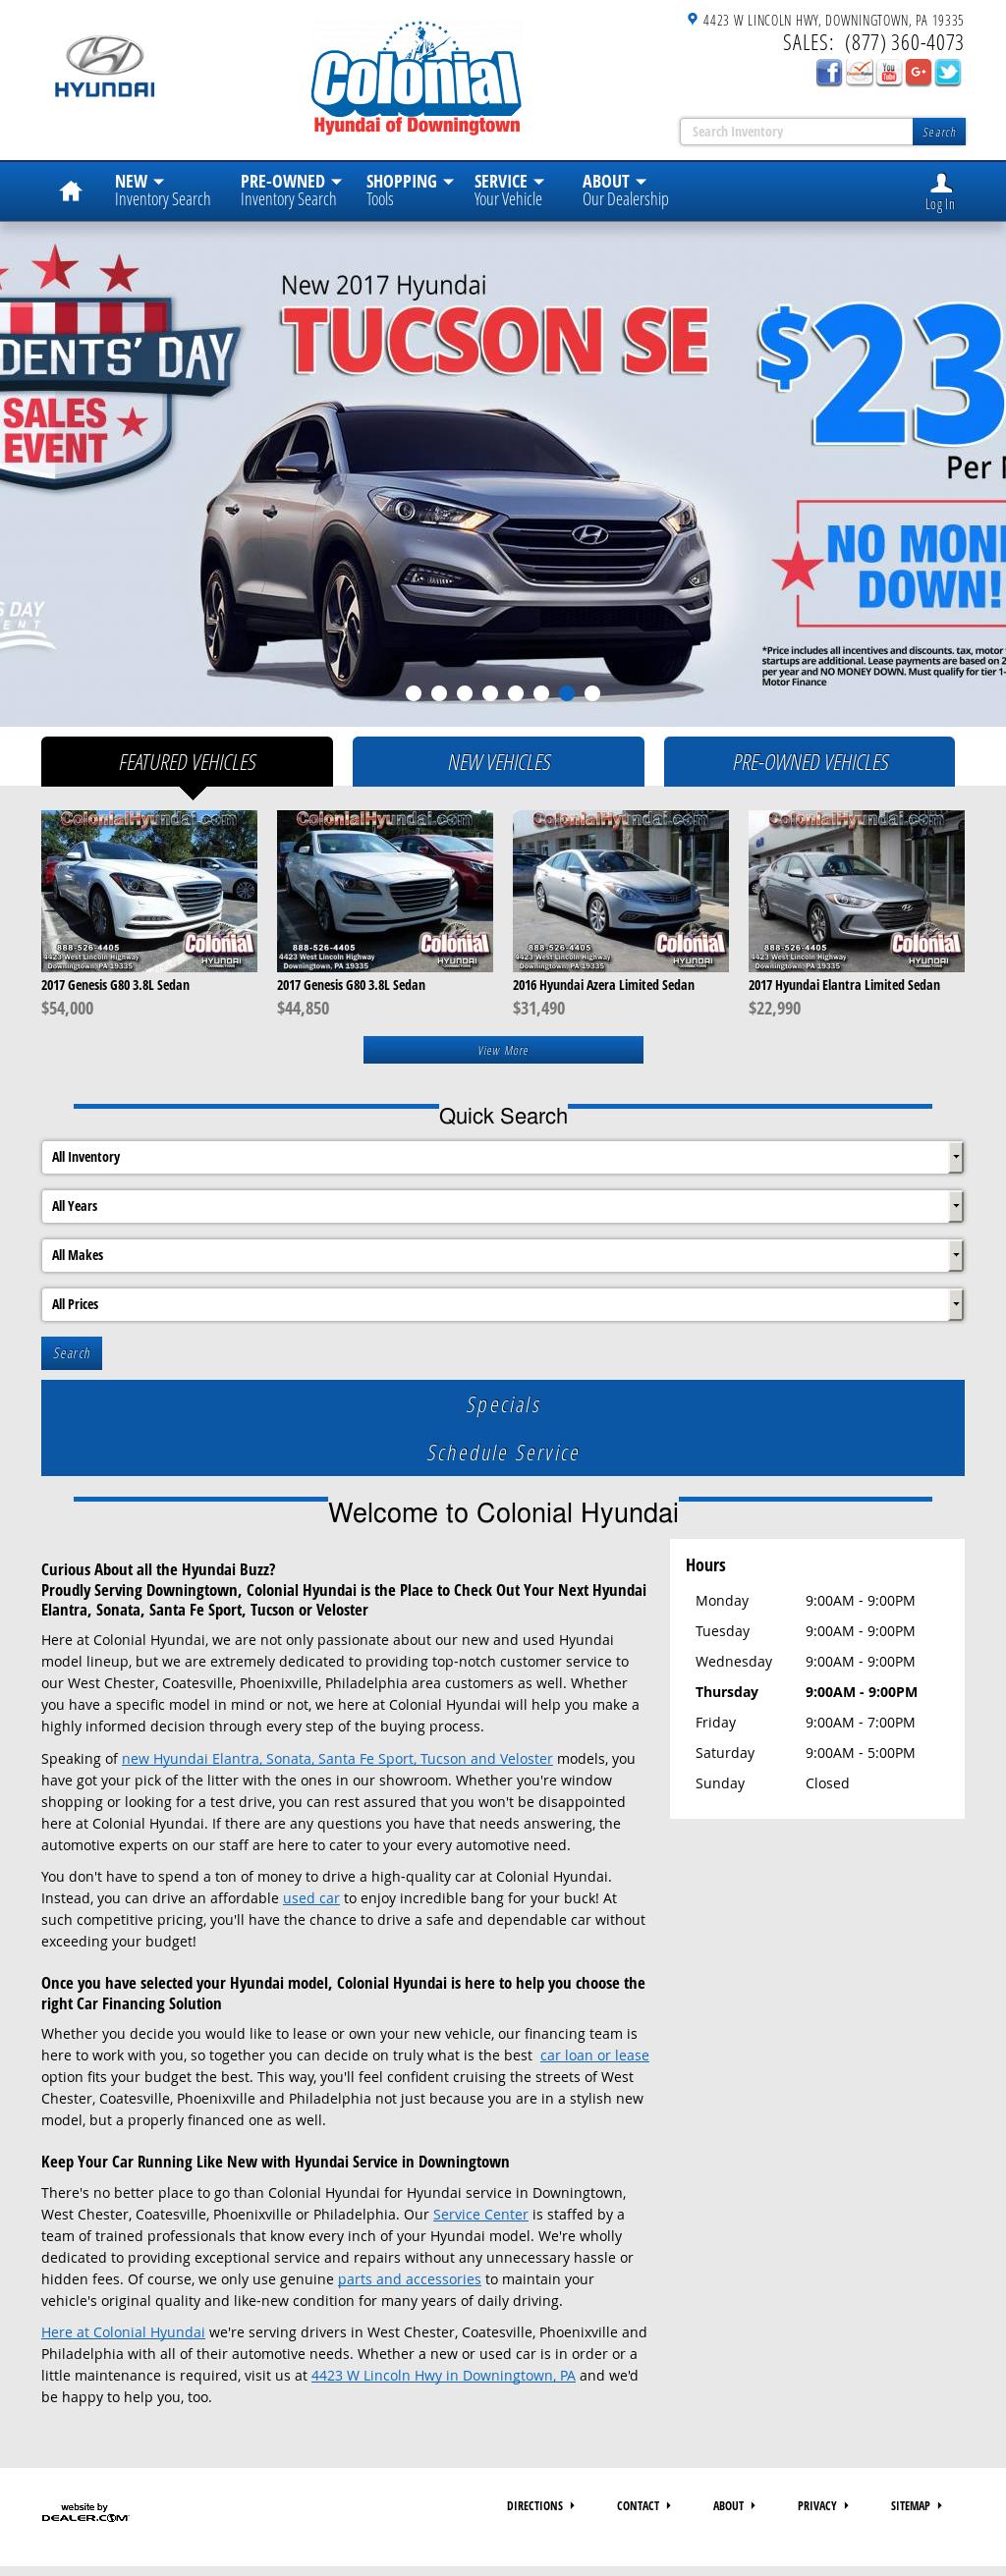 Colonial Hyundai Website History